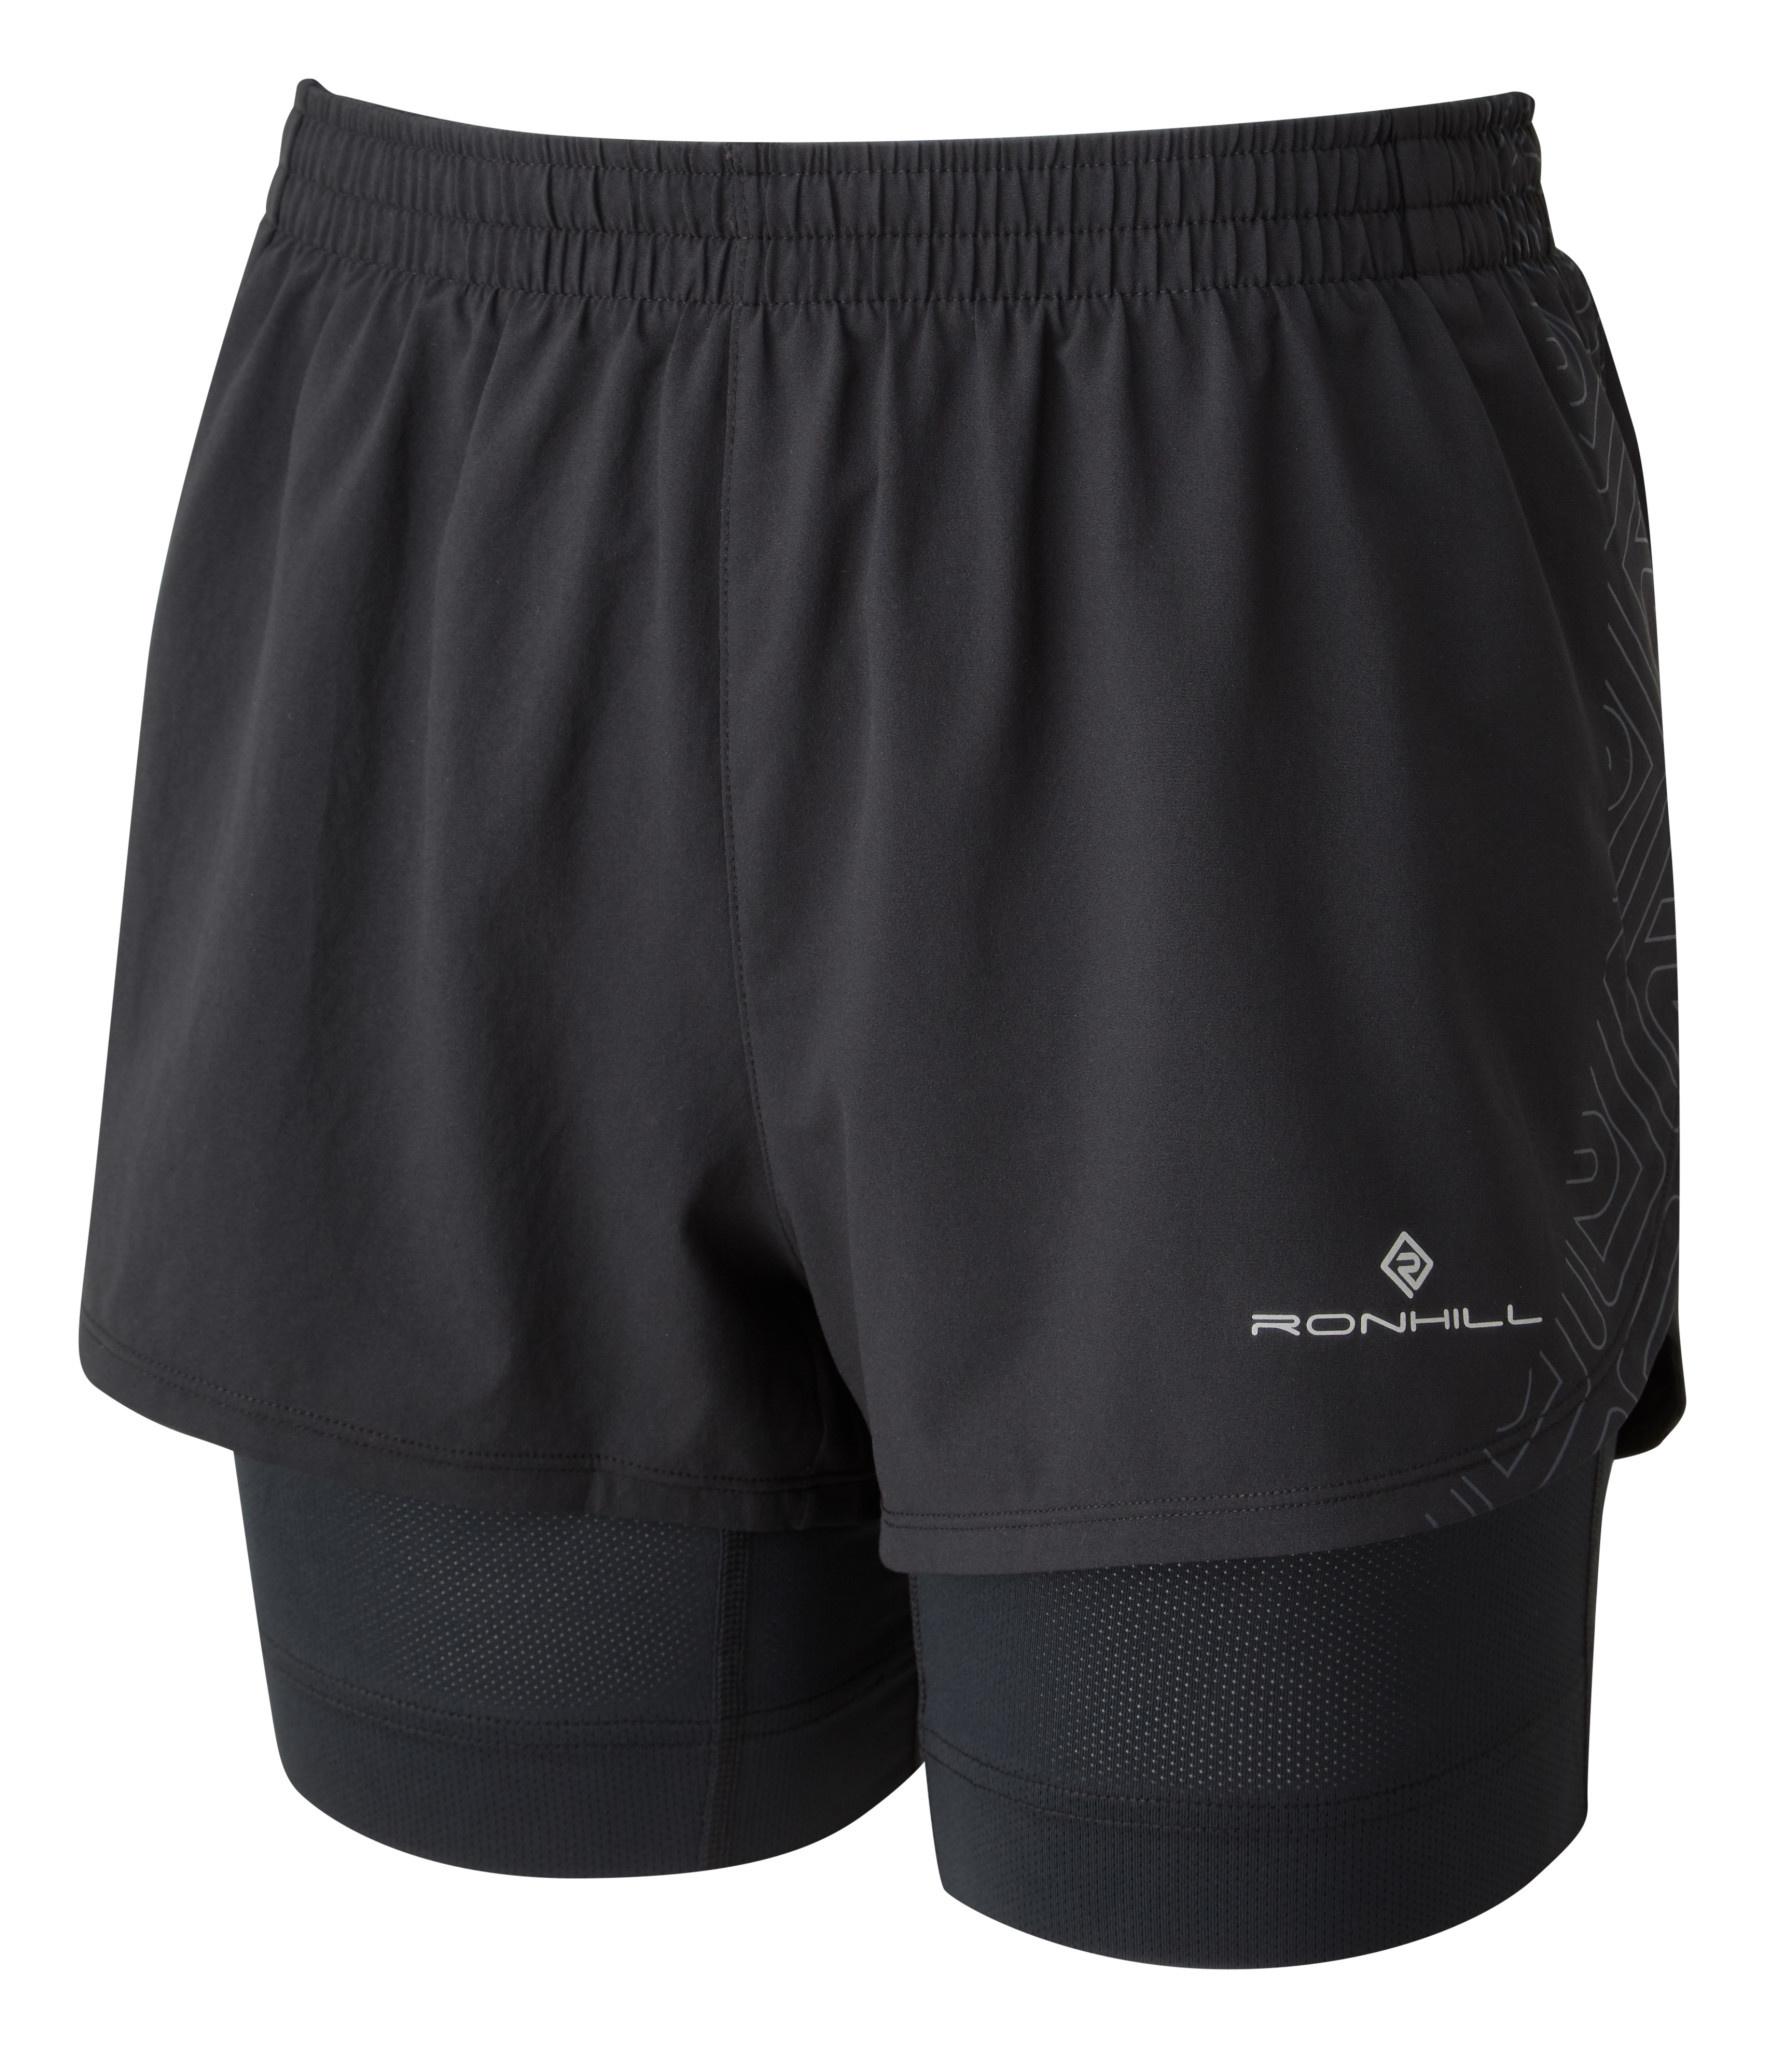 dames > shorts > 2 in 1 shorts